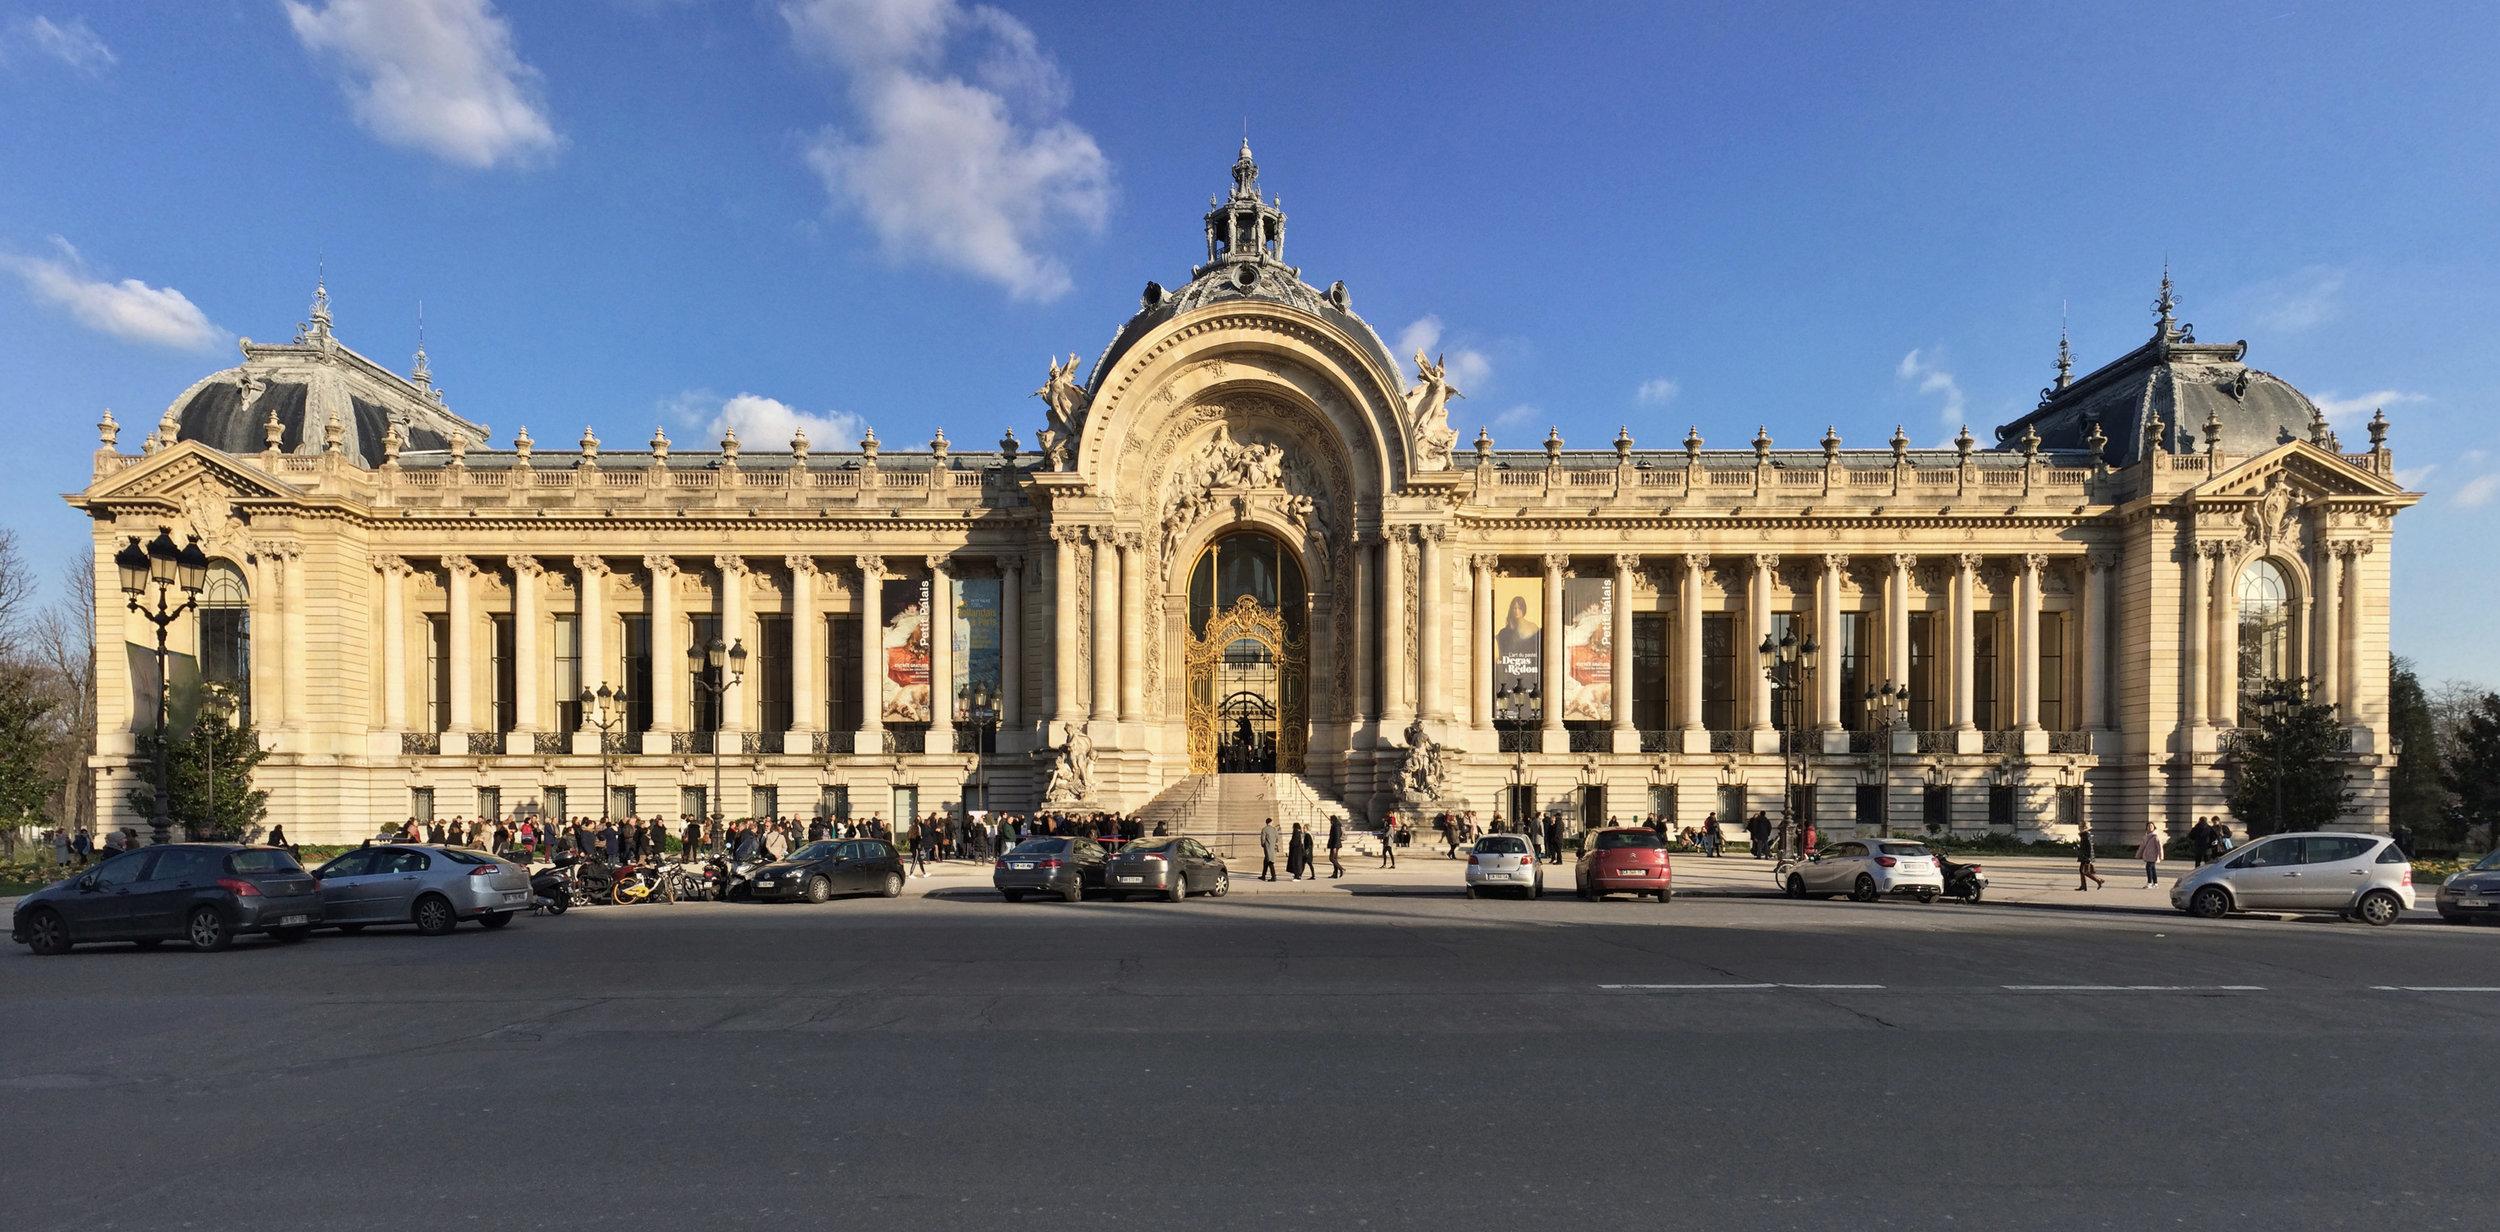 Petit-Palais-Paris-02-2018.jpg